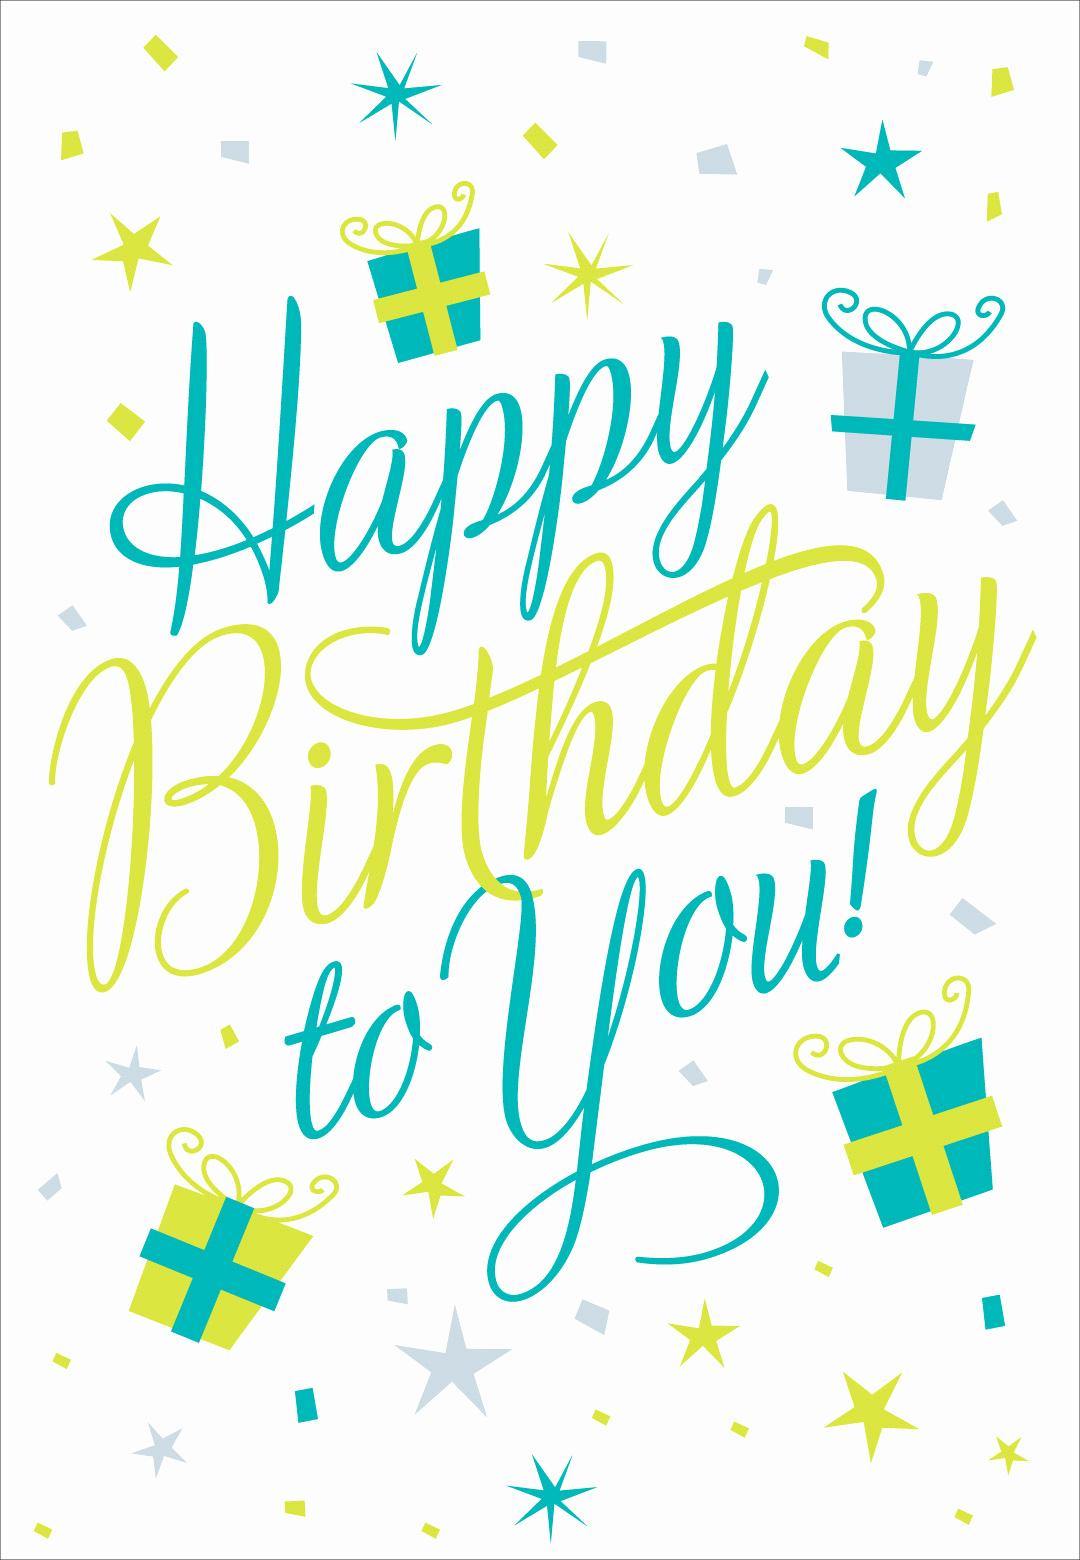 Free Happy Birthday Picture Unique Happy Birthday to You Birthday Card Free